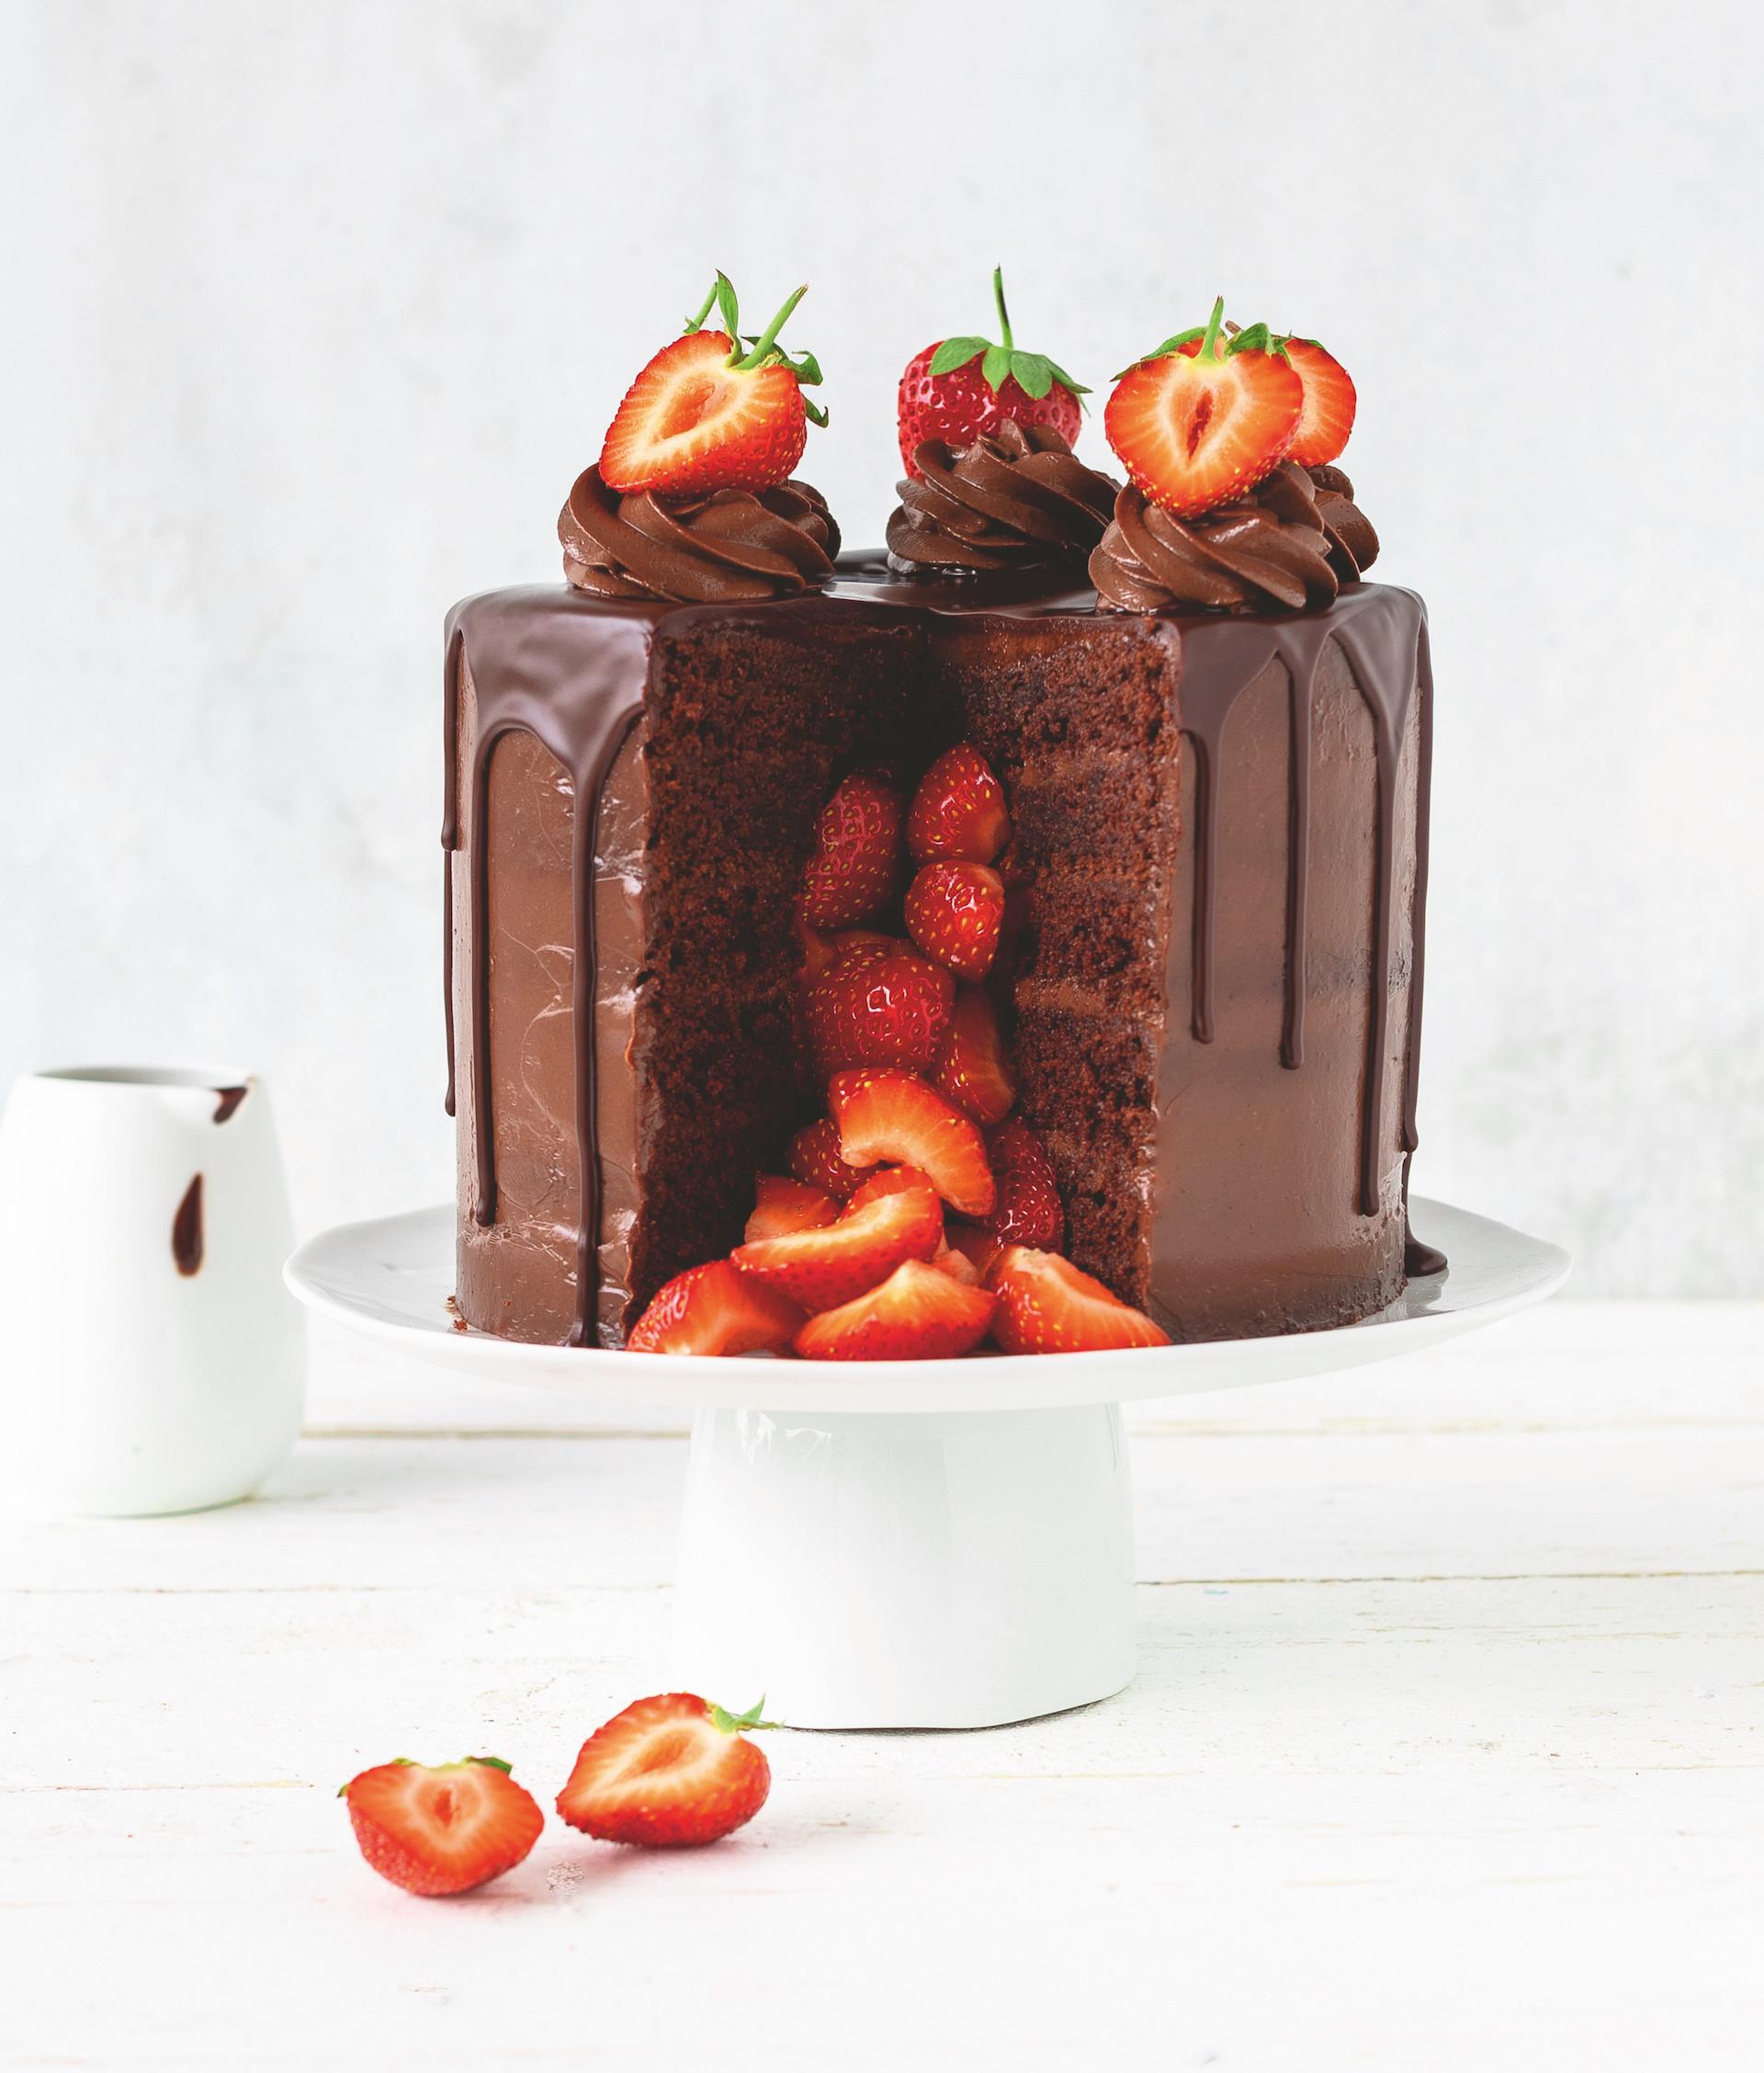 Pinata Erdbeer-Schokoladentorte